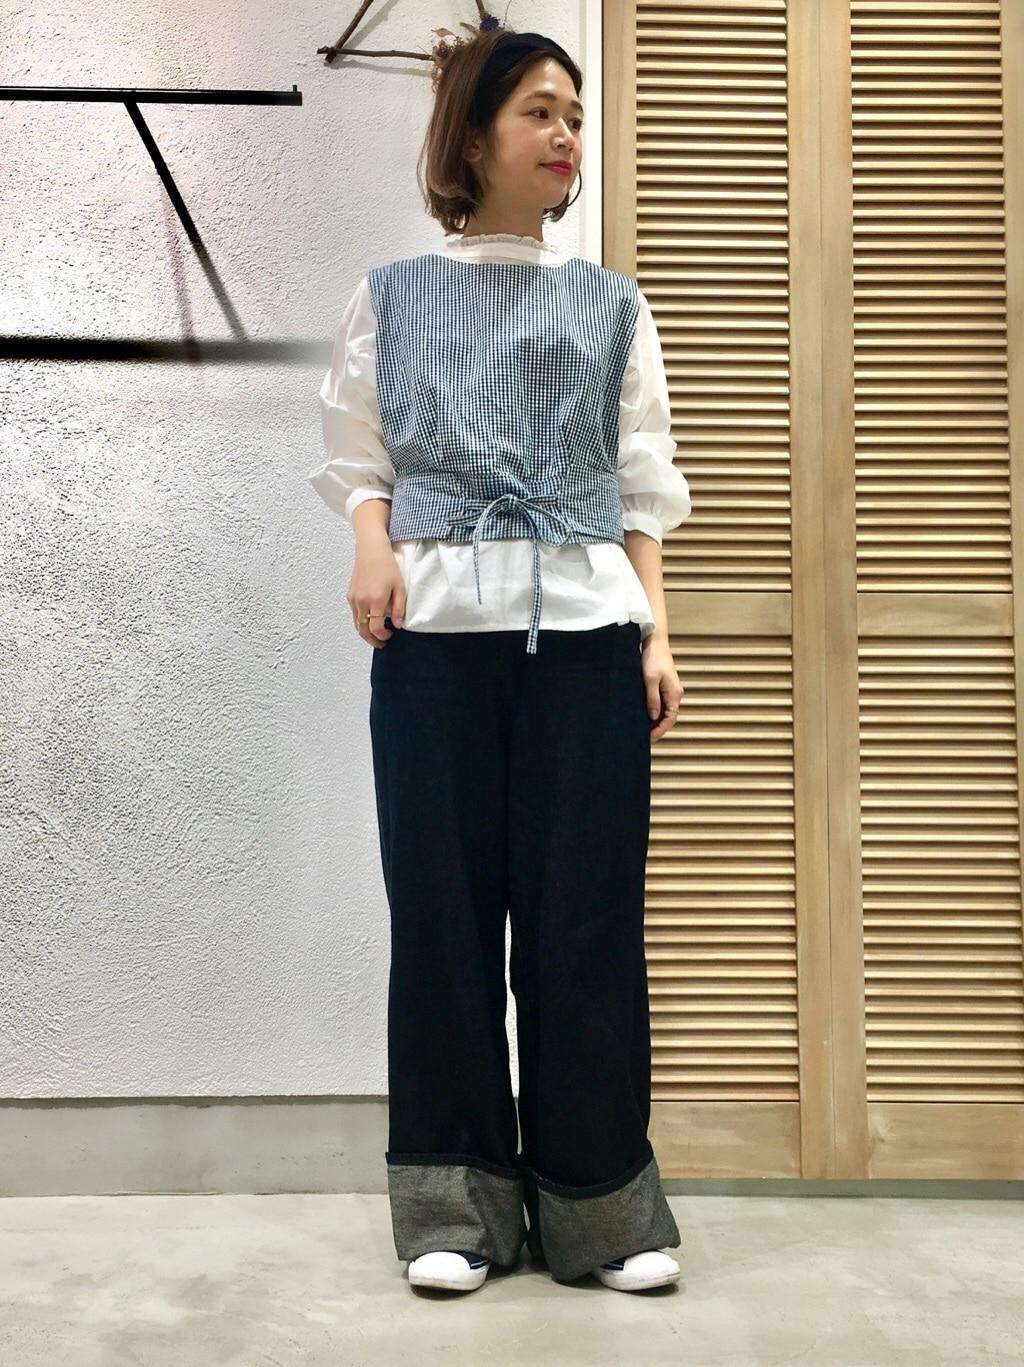 chambre de charme 横浜ジョイナス 身長:160cm 2021.02.07